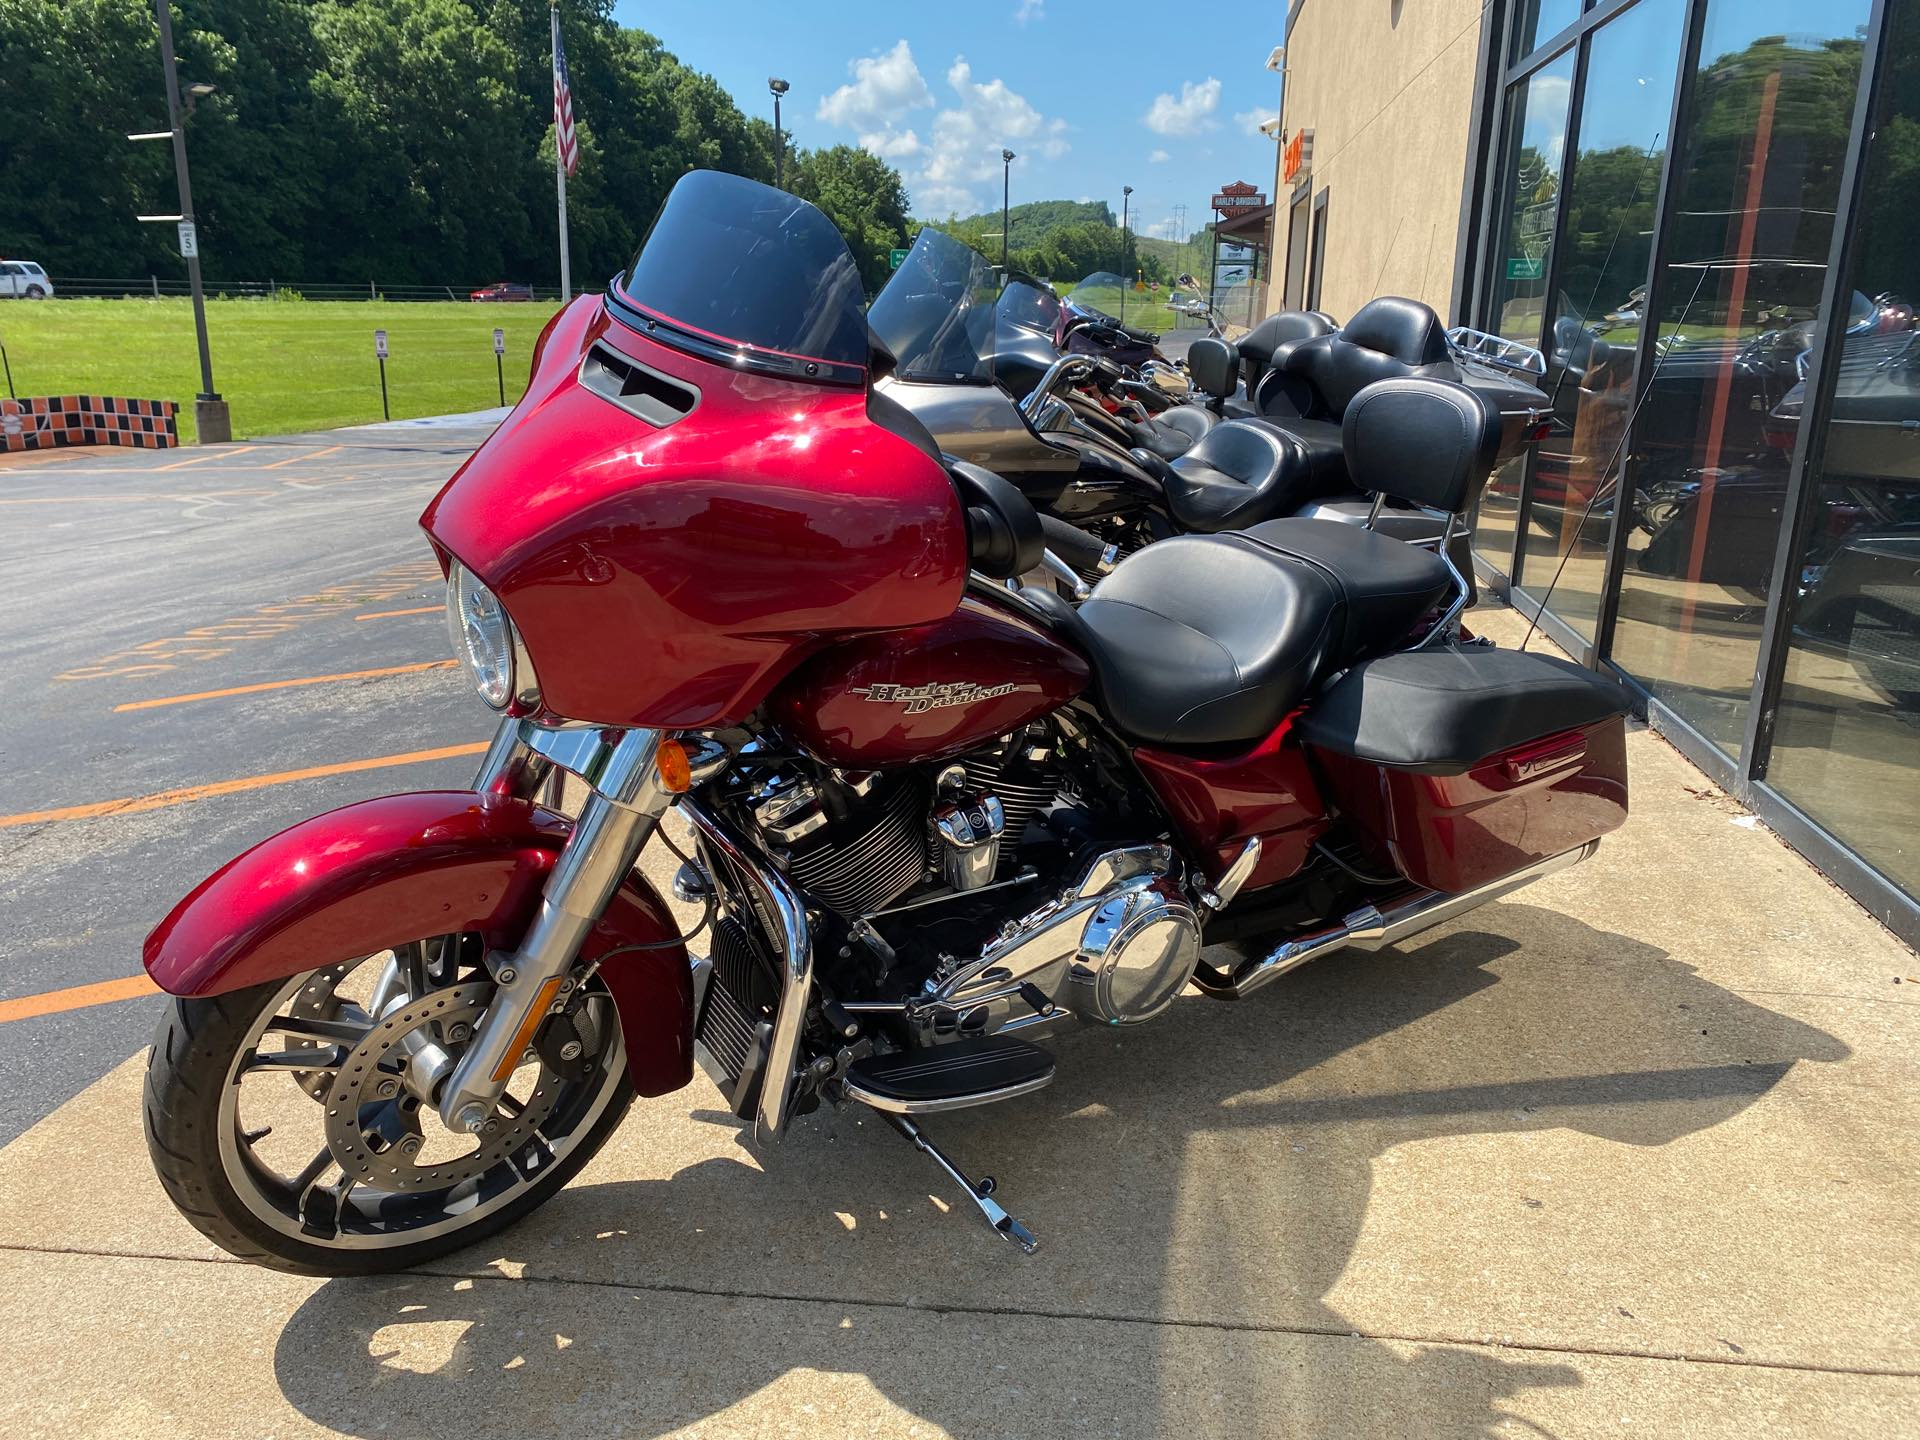 2017 Harley-Davidson Street Glide Base at Gold Star Harley-Davidson